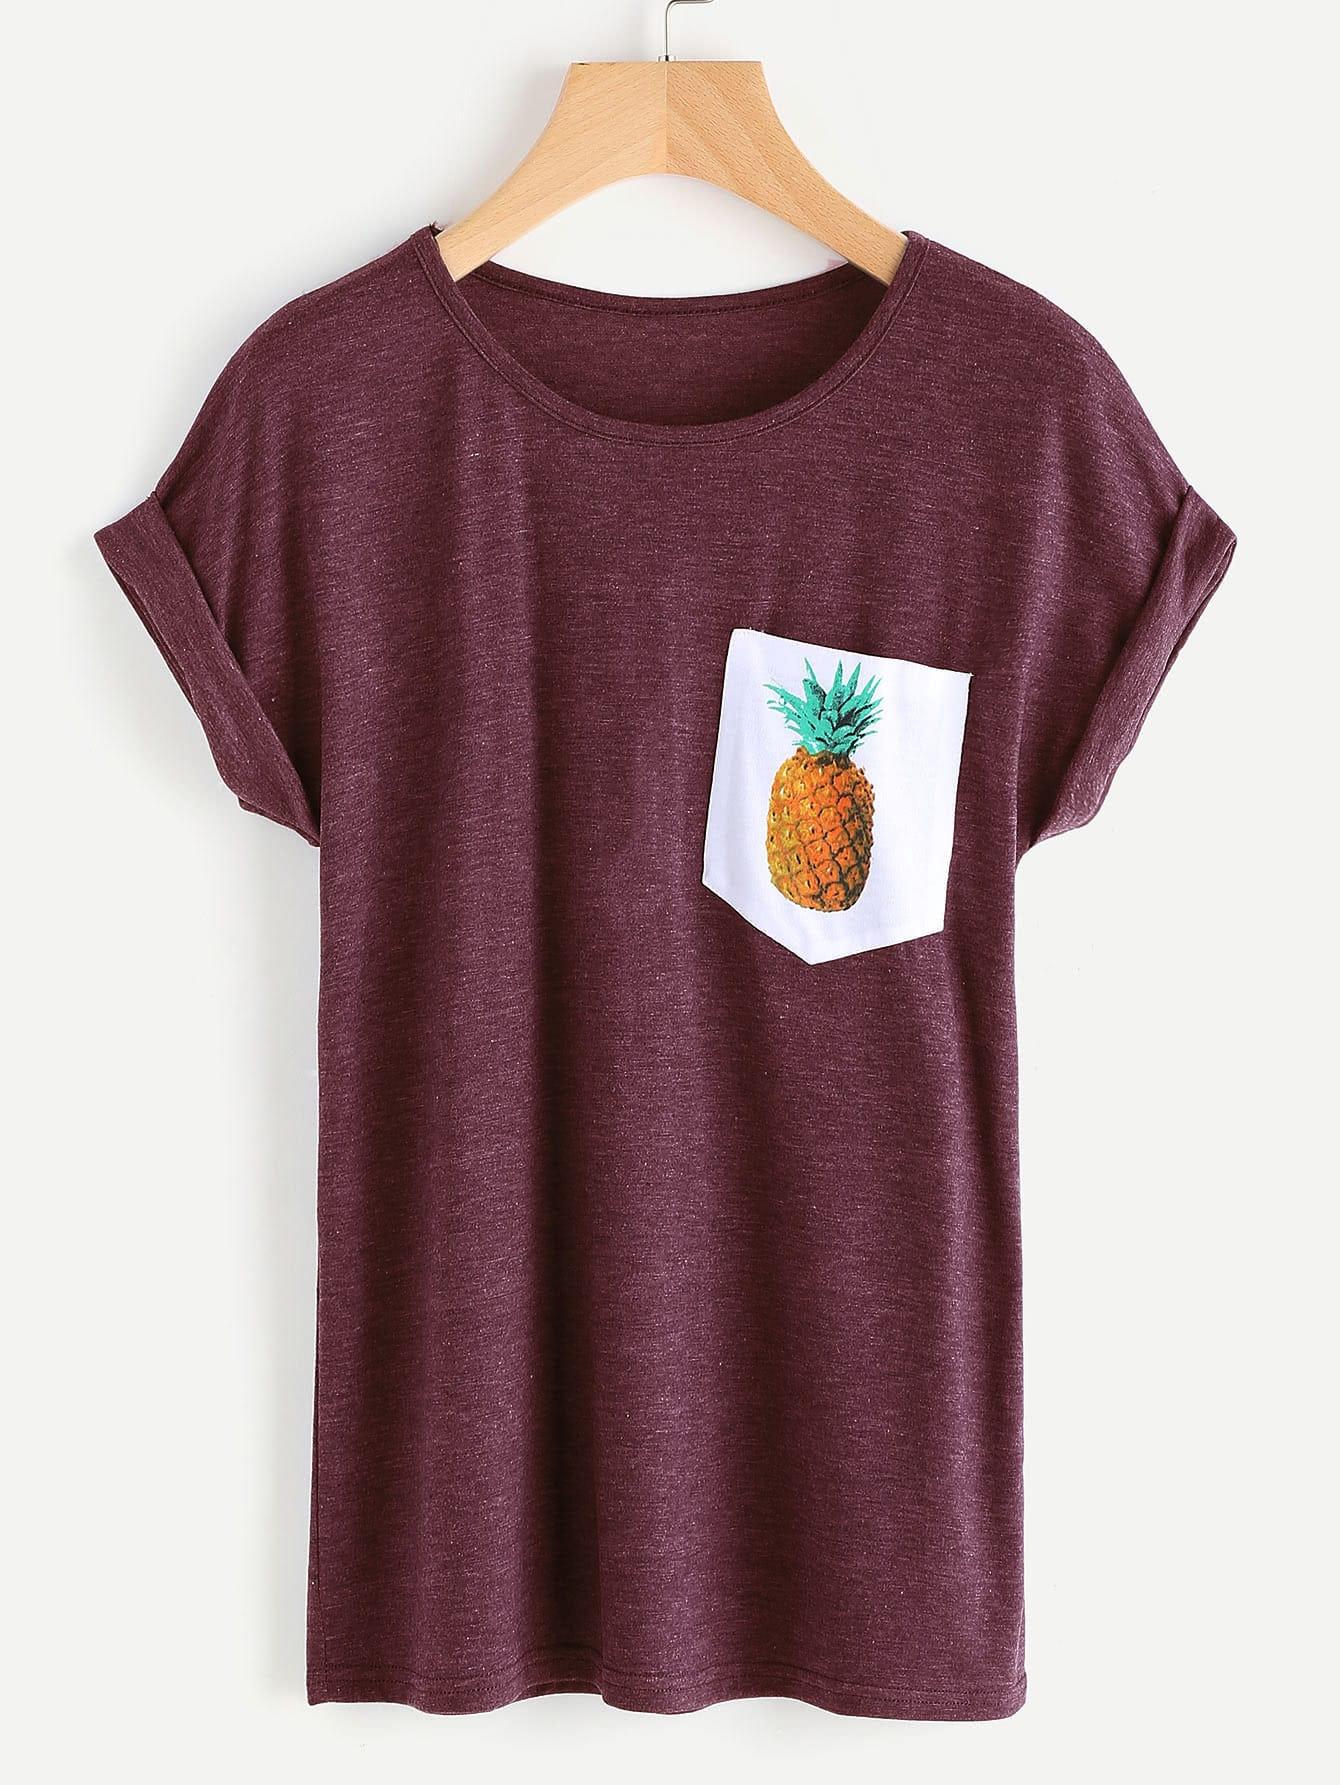 Фото Contrast Pineapple Print Pocket Marled Cuffed Tee. Купить с доставкой